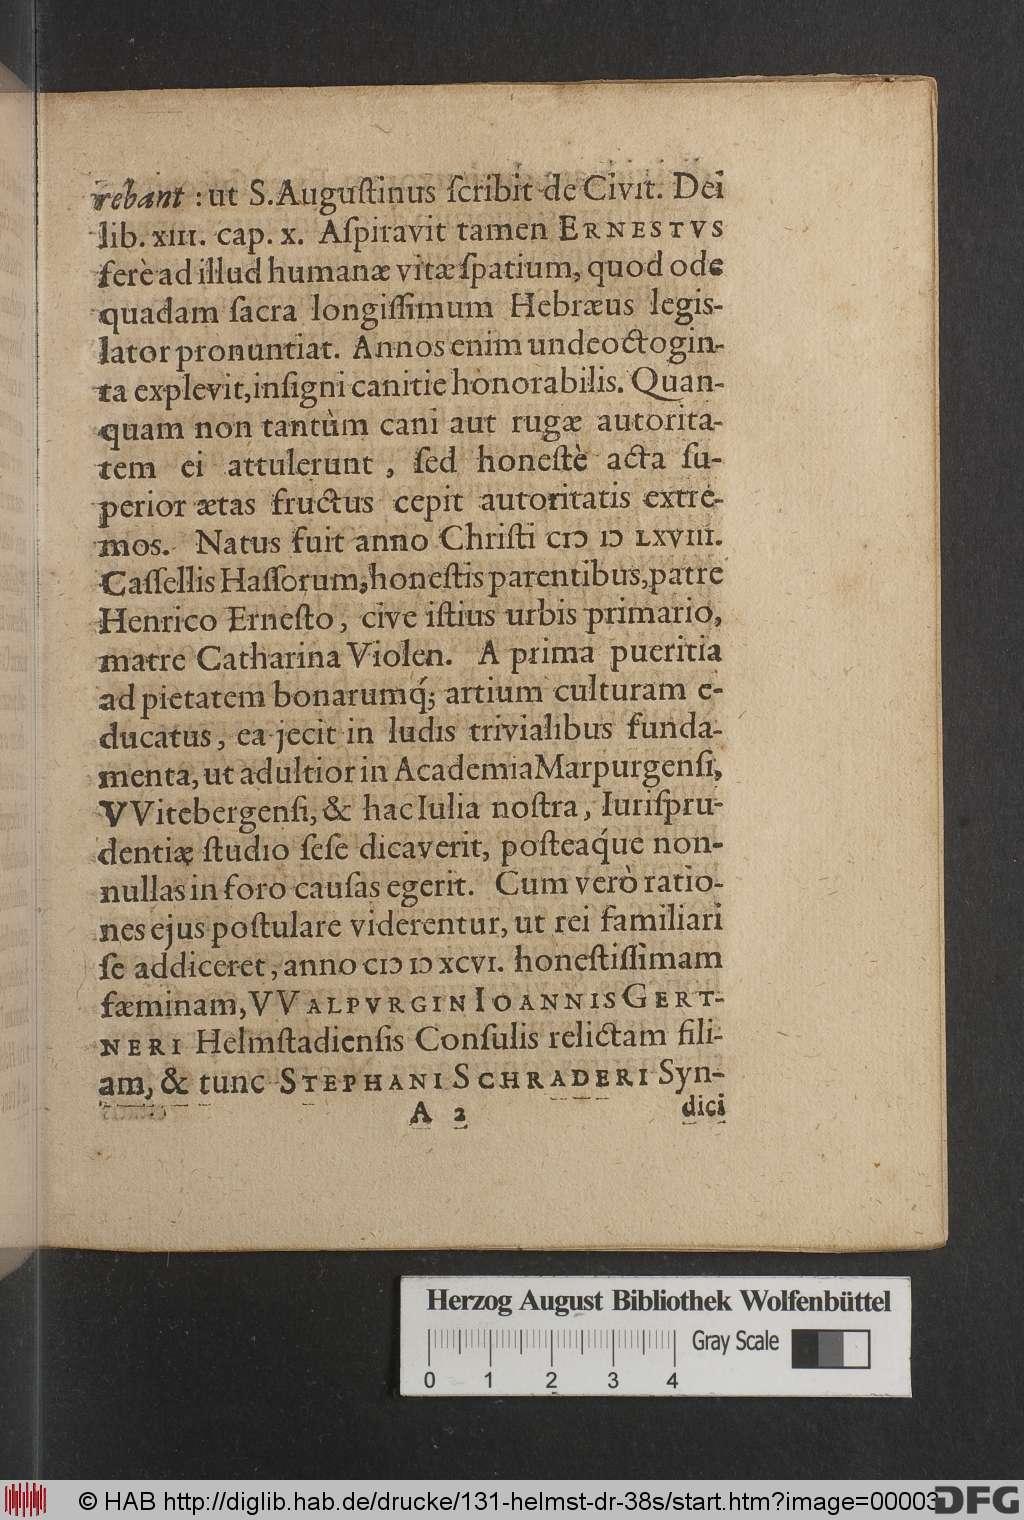 http://diglib.hab.de/drucke/131-helmst-dr-38s/00003.jpg